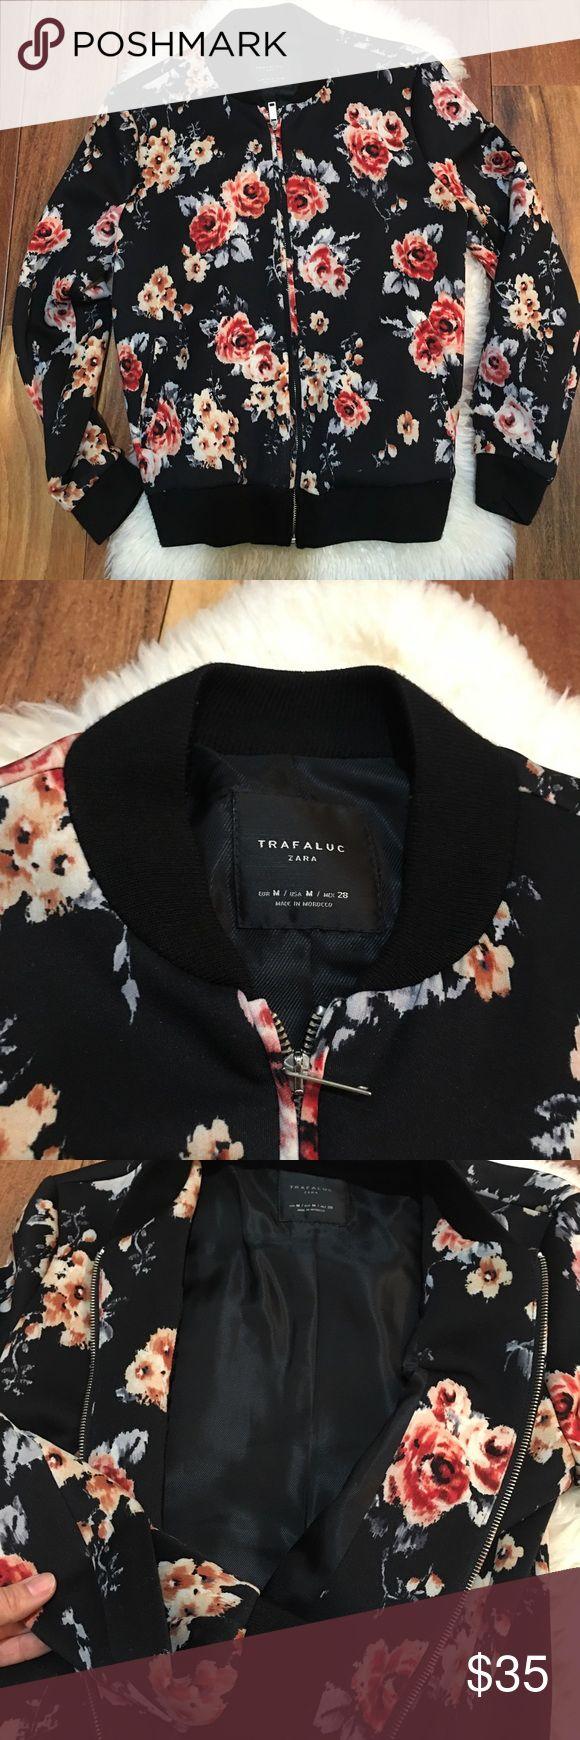 Zara floral bomber jacket size M Zara floral bomber jacket size M , good condition! Zara Jackets & Coats